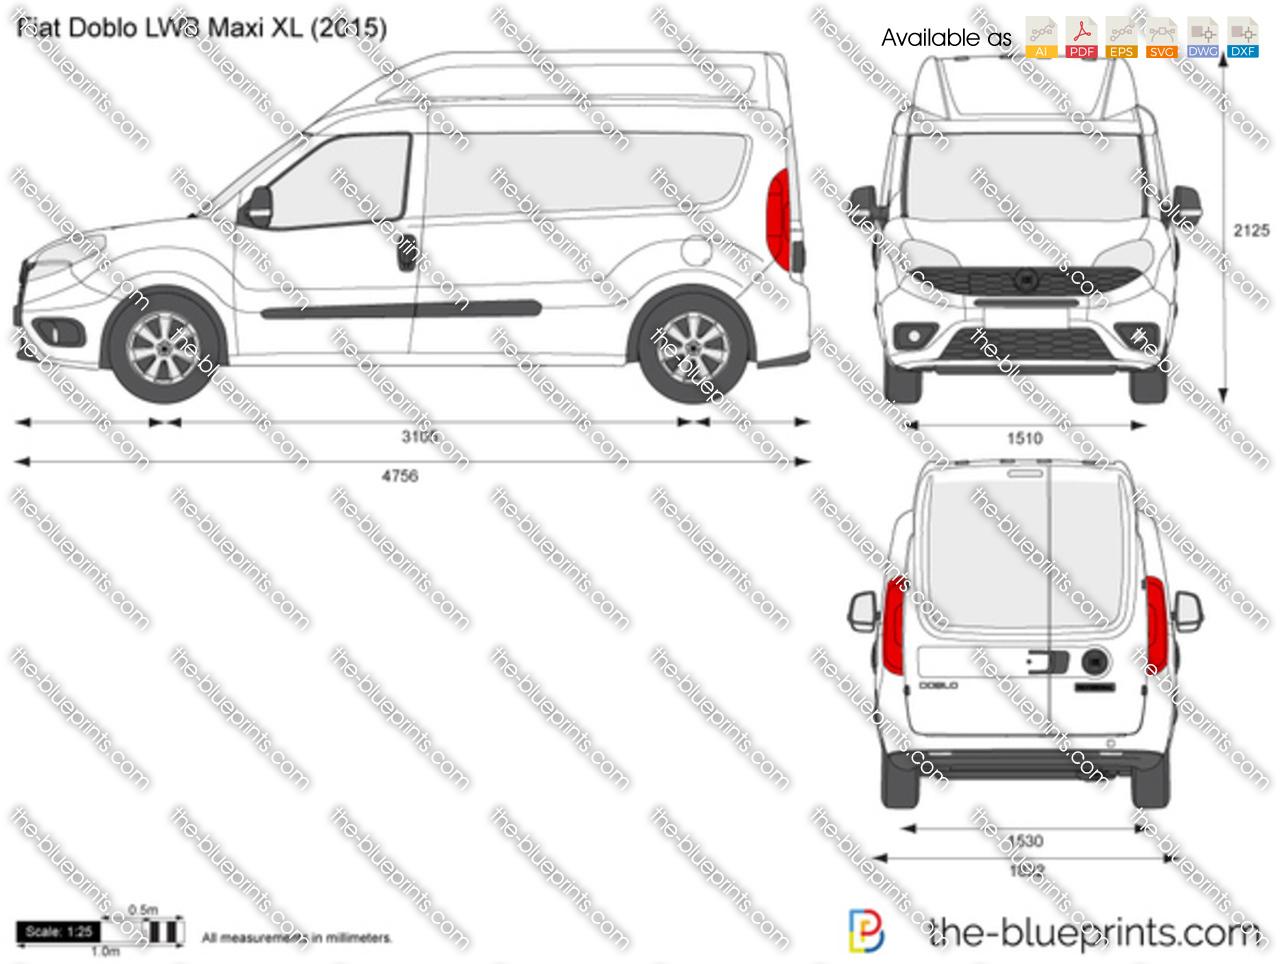 Fiat Doblo LWB Maxi XL